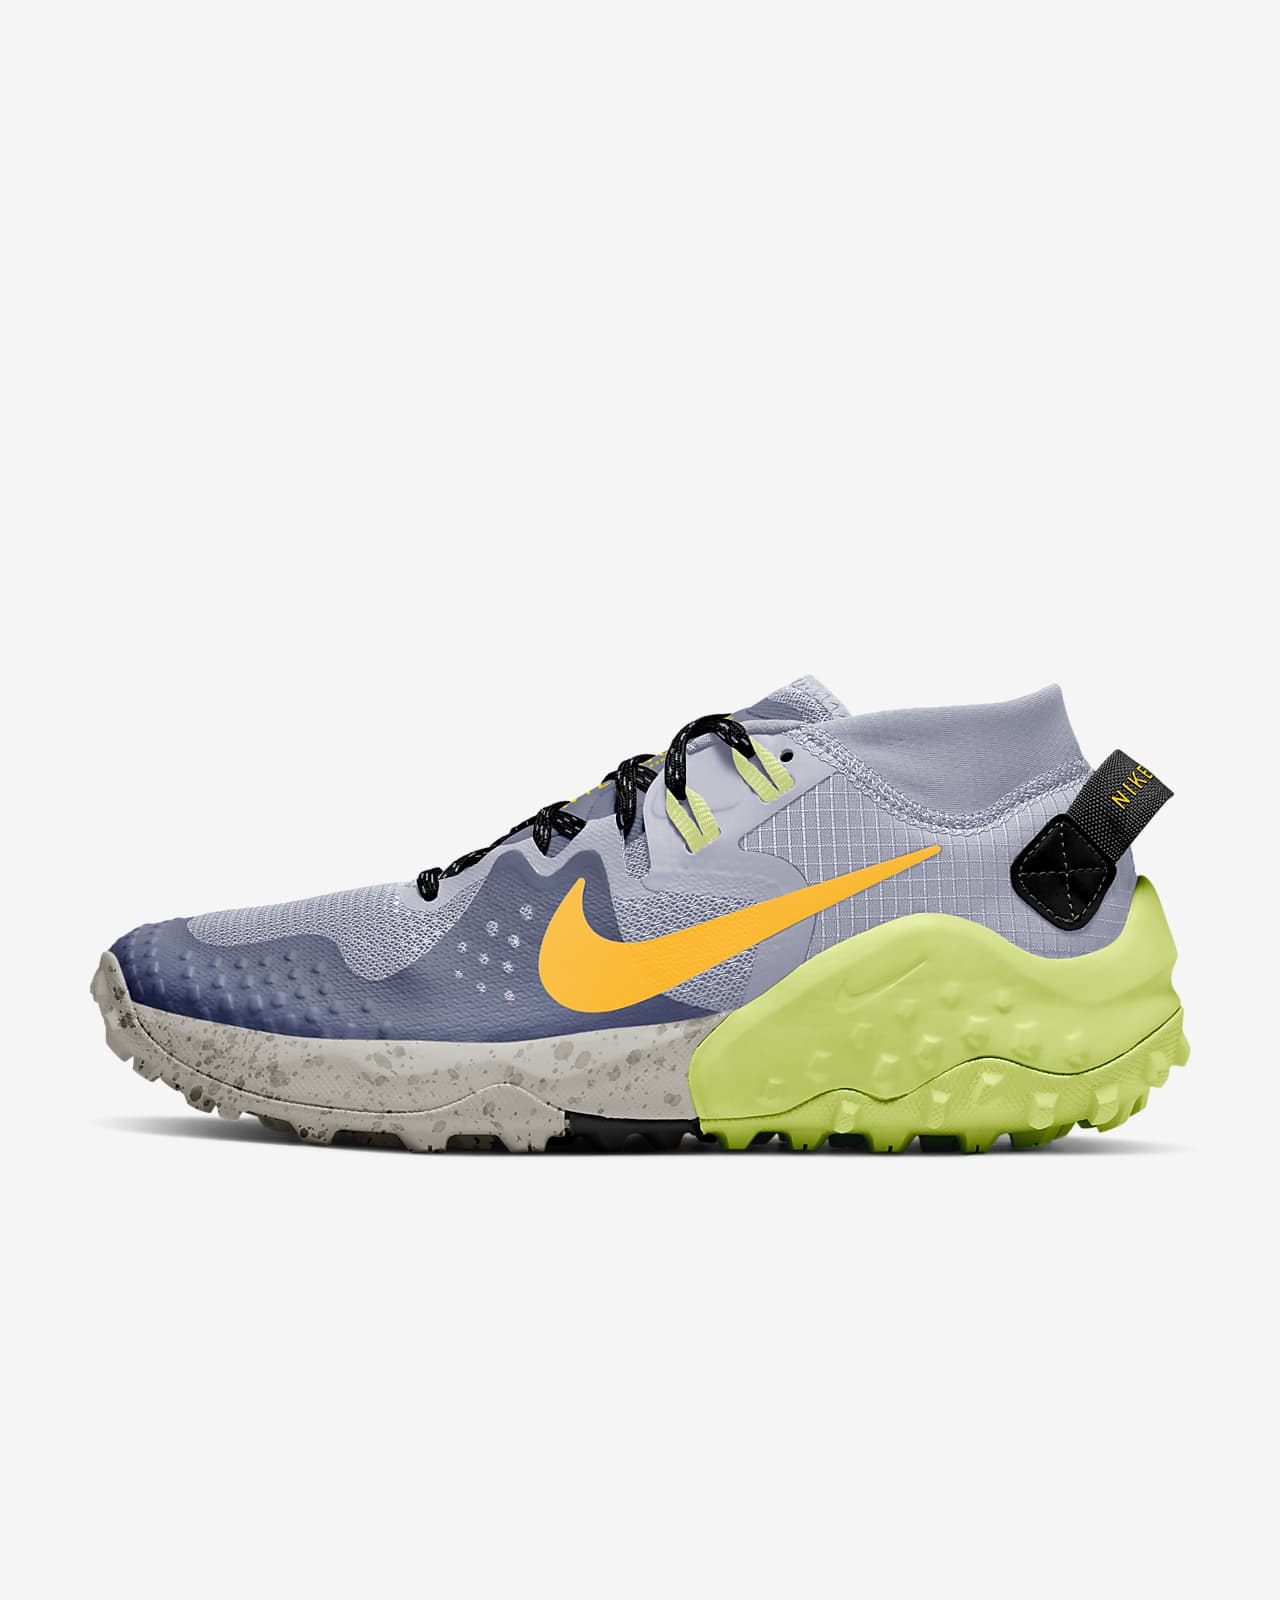 Nike Wildhorse 6 Zapatillas de trail running - Mujer